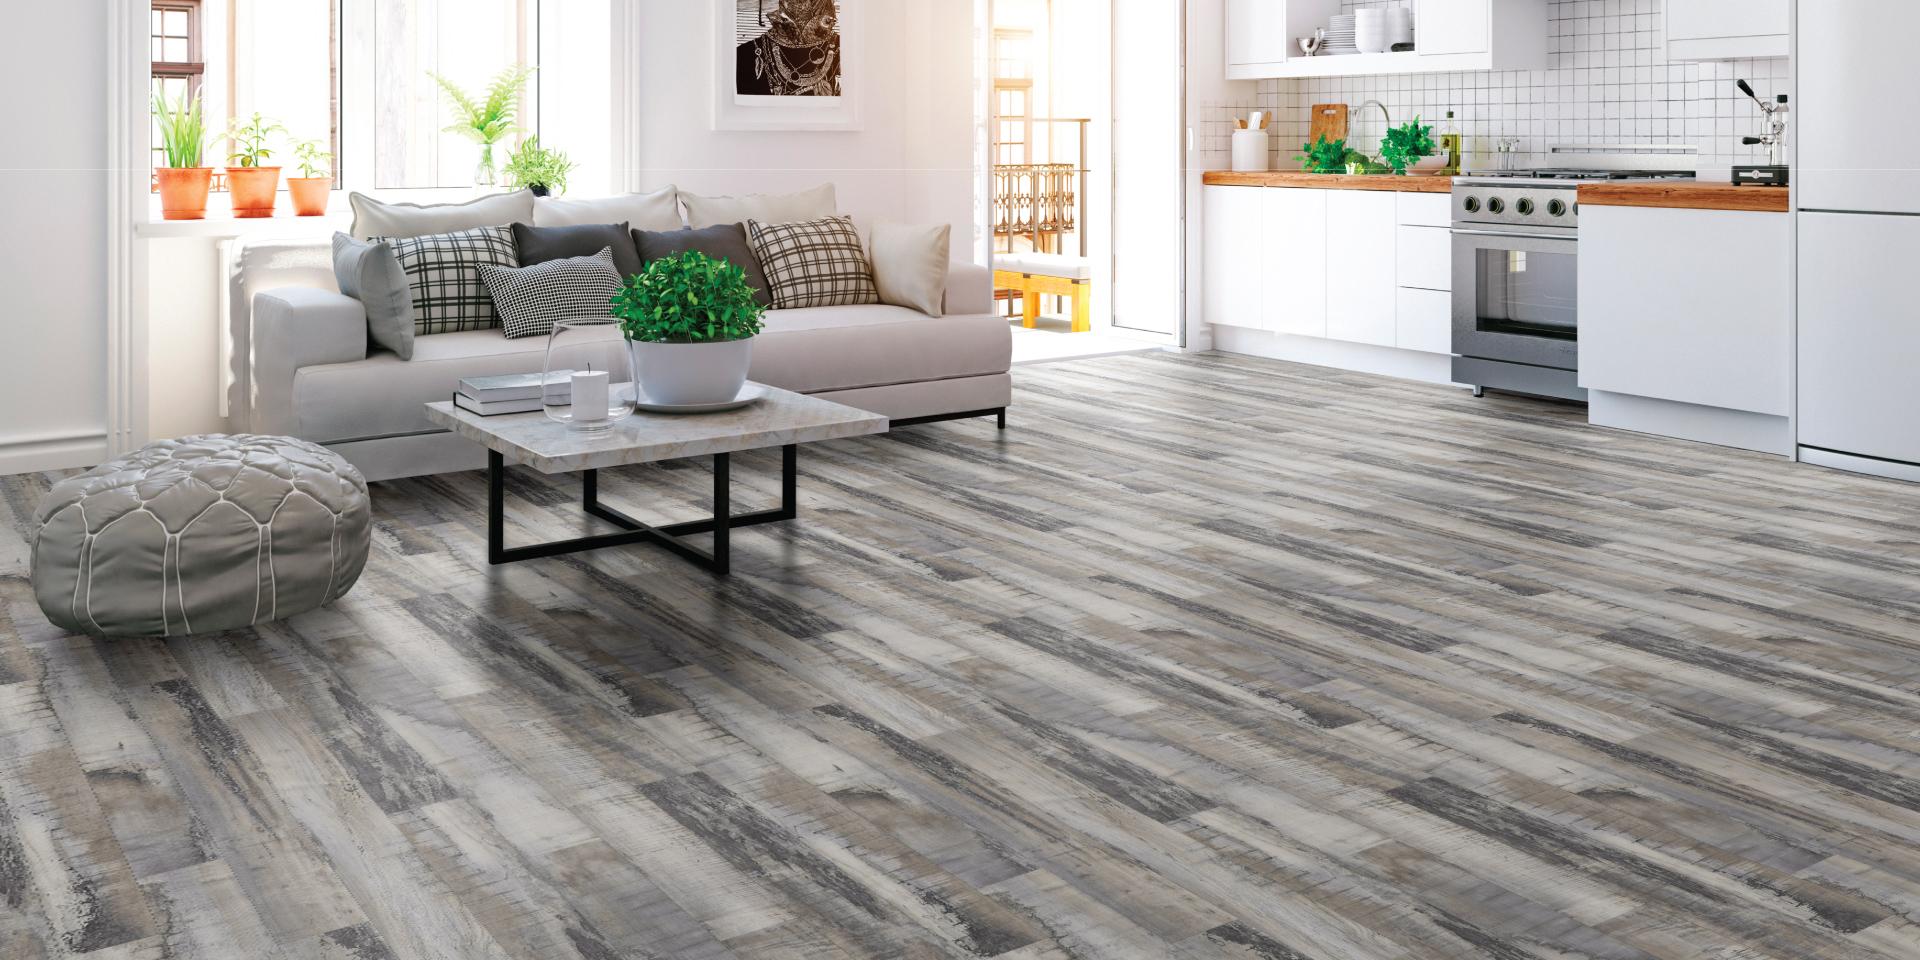 eglinton carpets laminate flooring toronto laminate installation